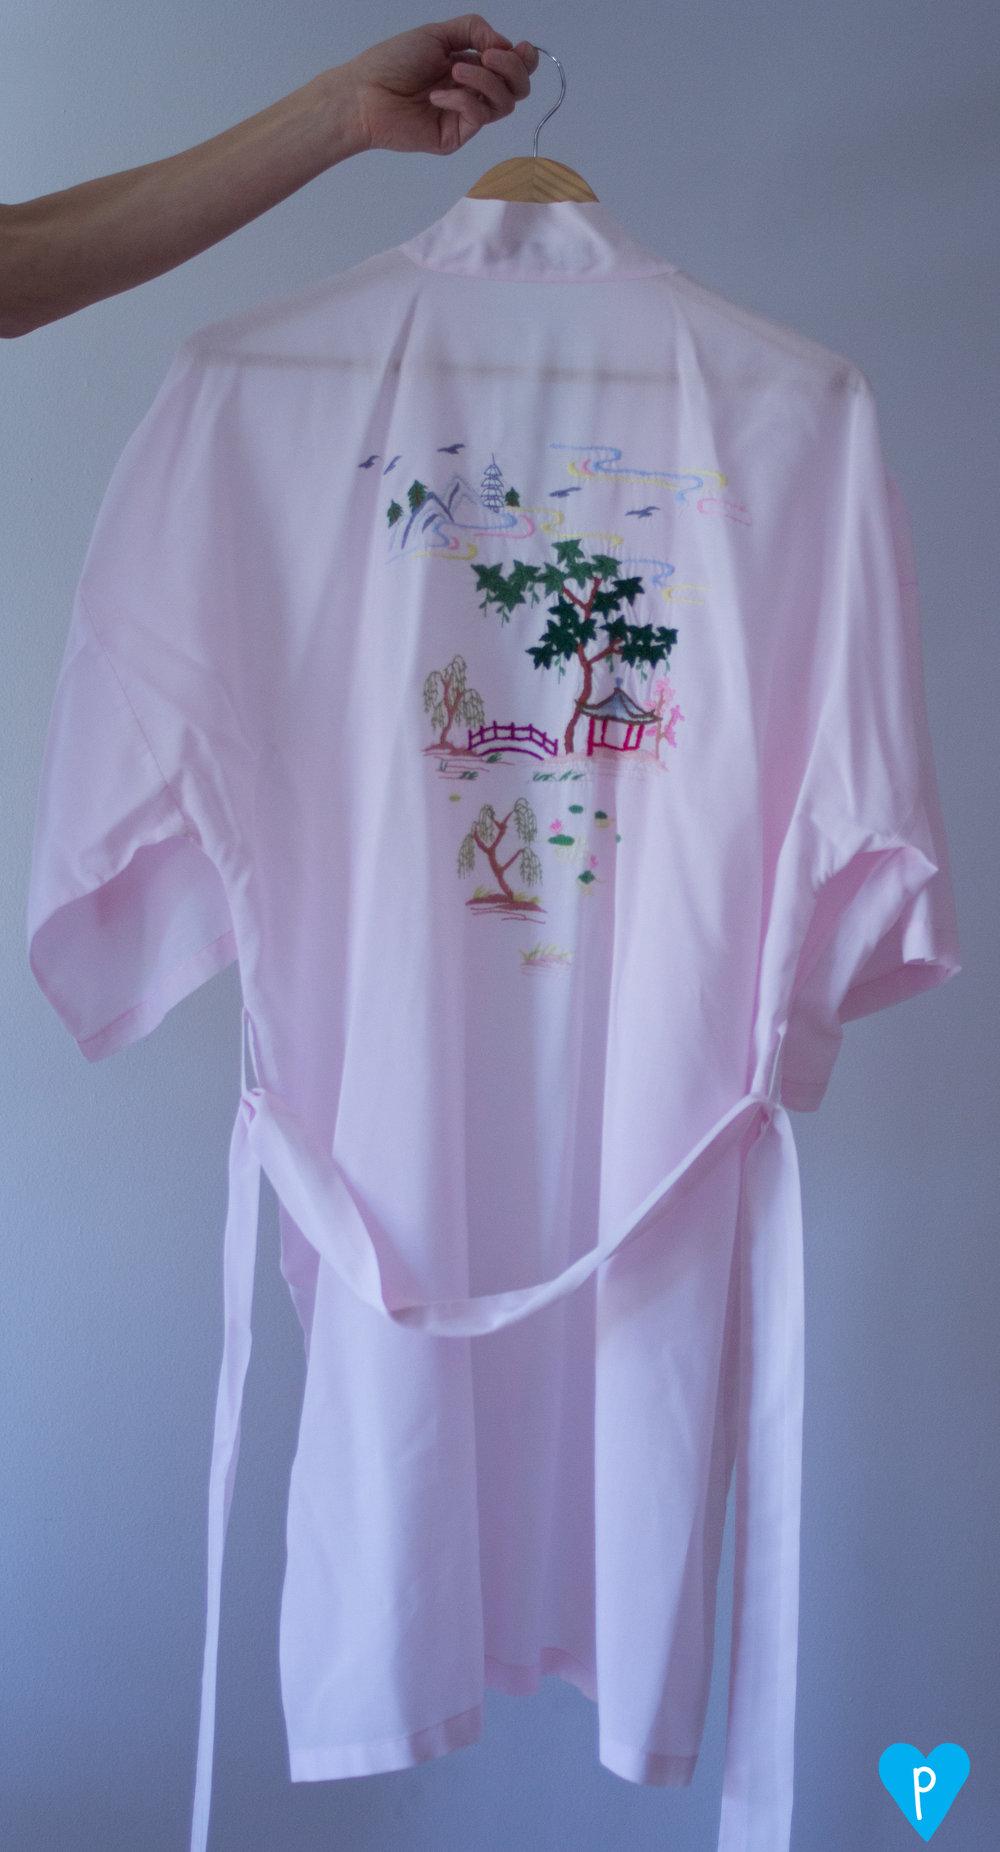 A cotton robe option